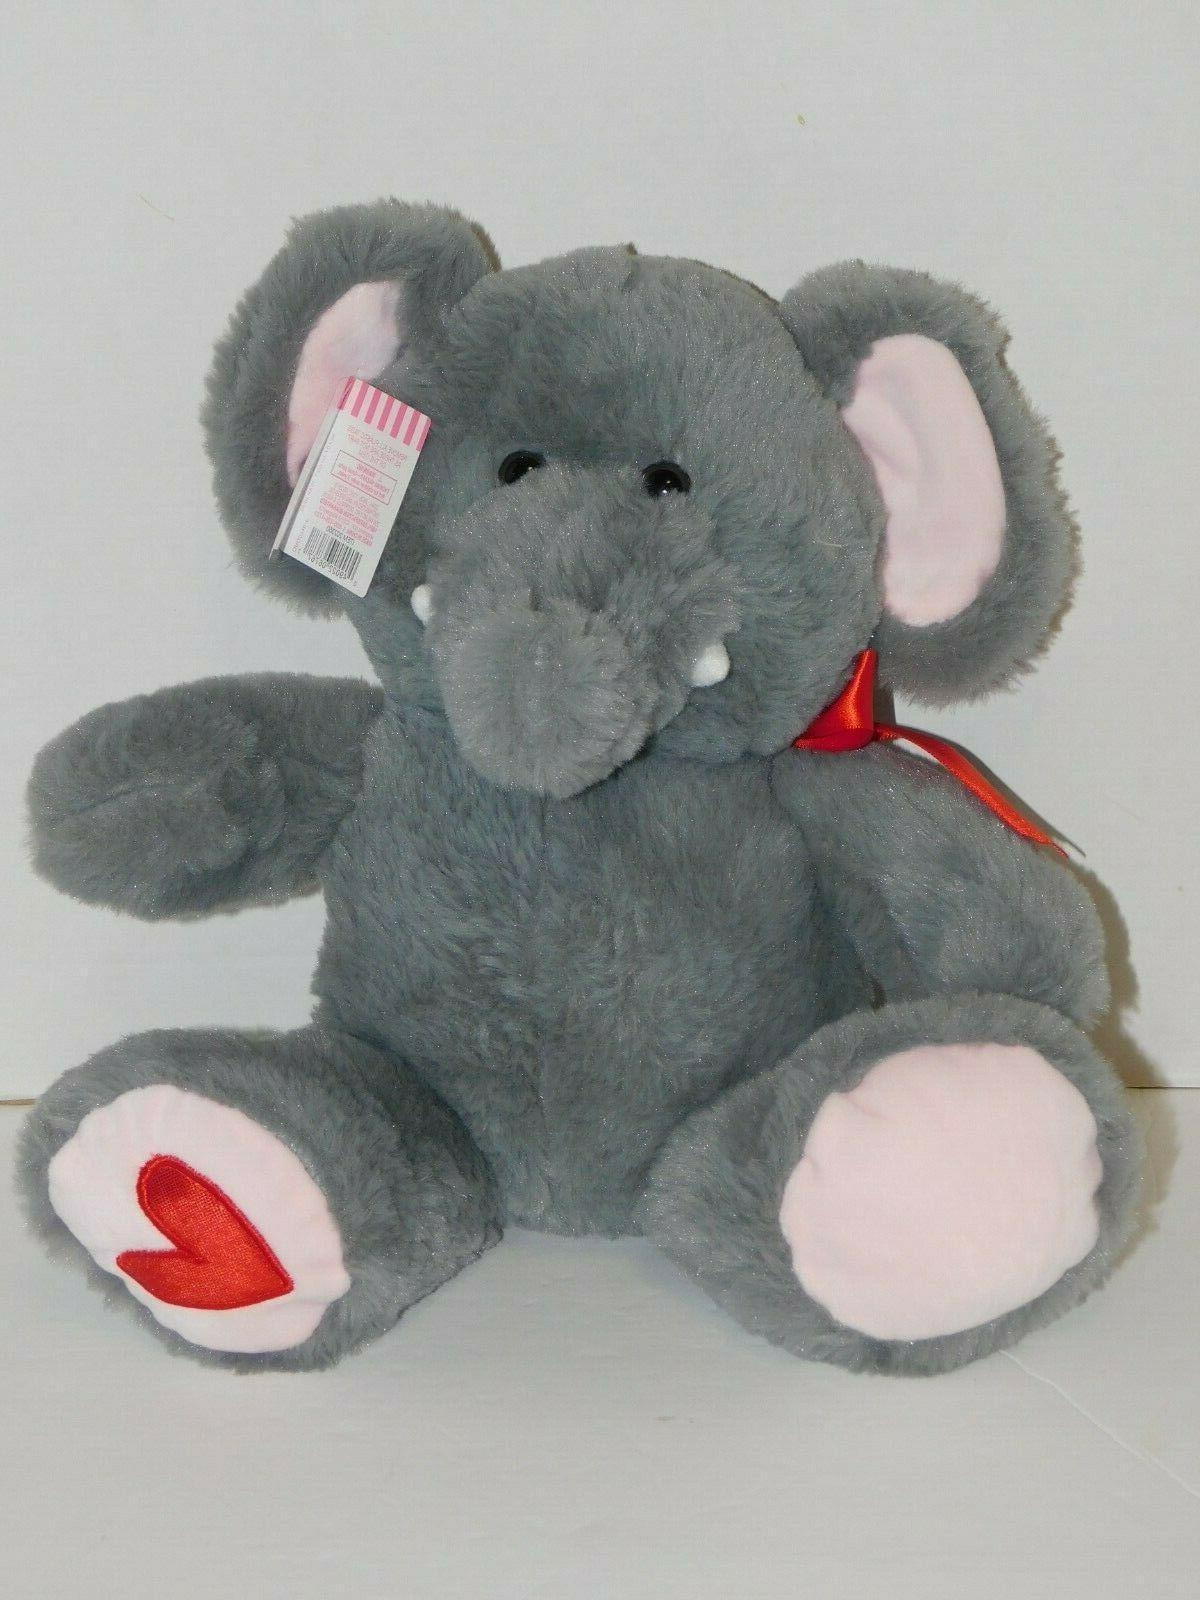 Elephant Plush Stuffed Animal 10.5